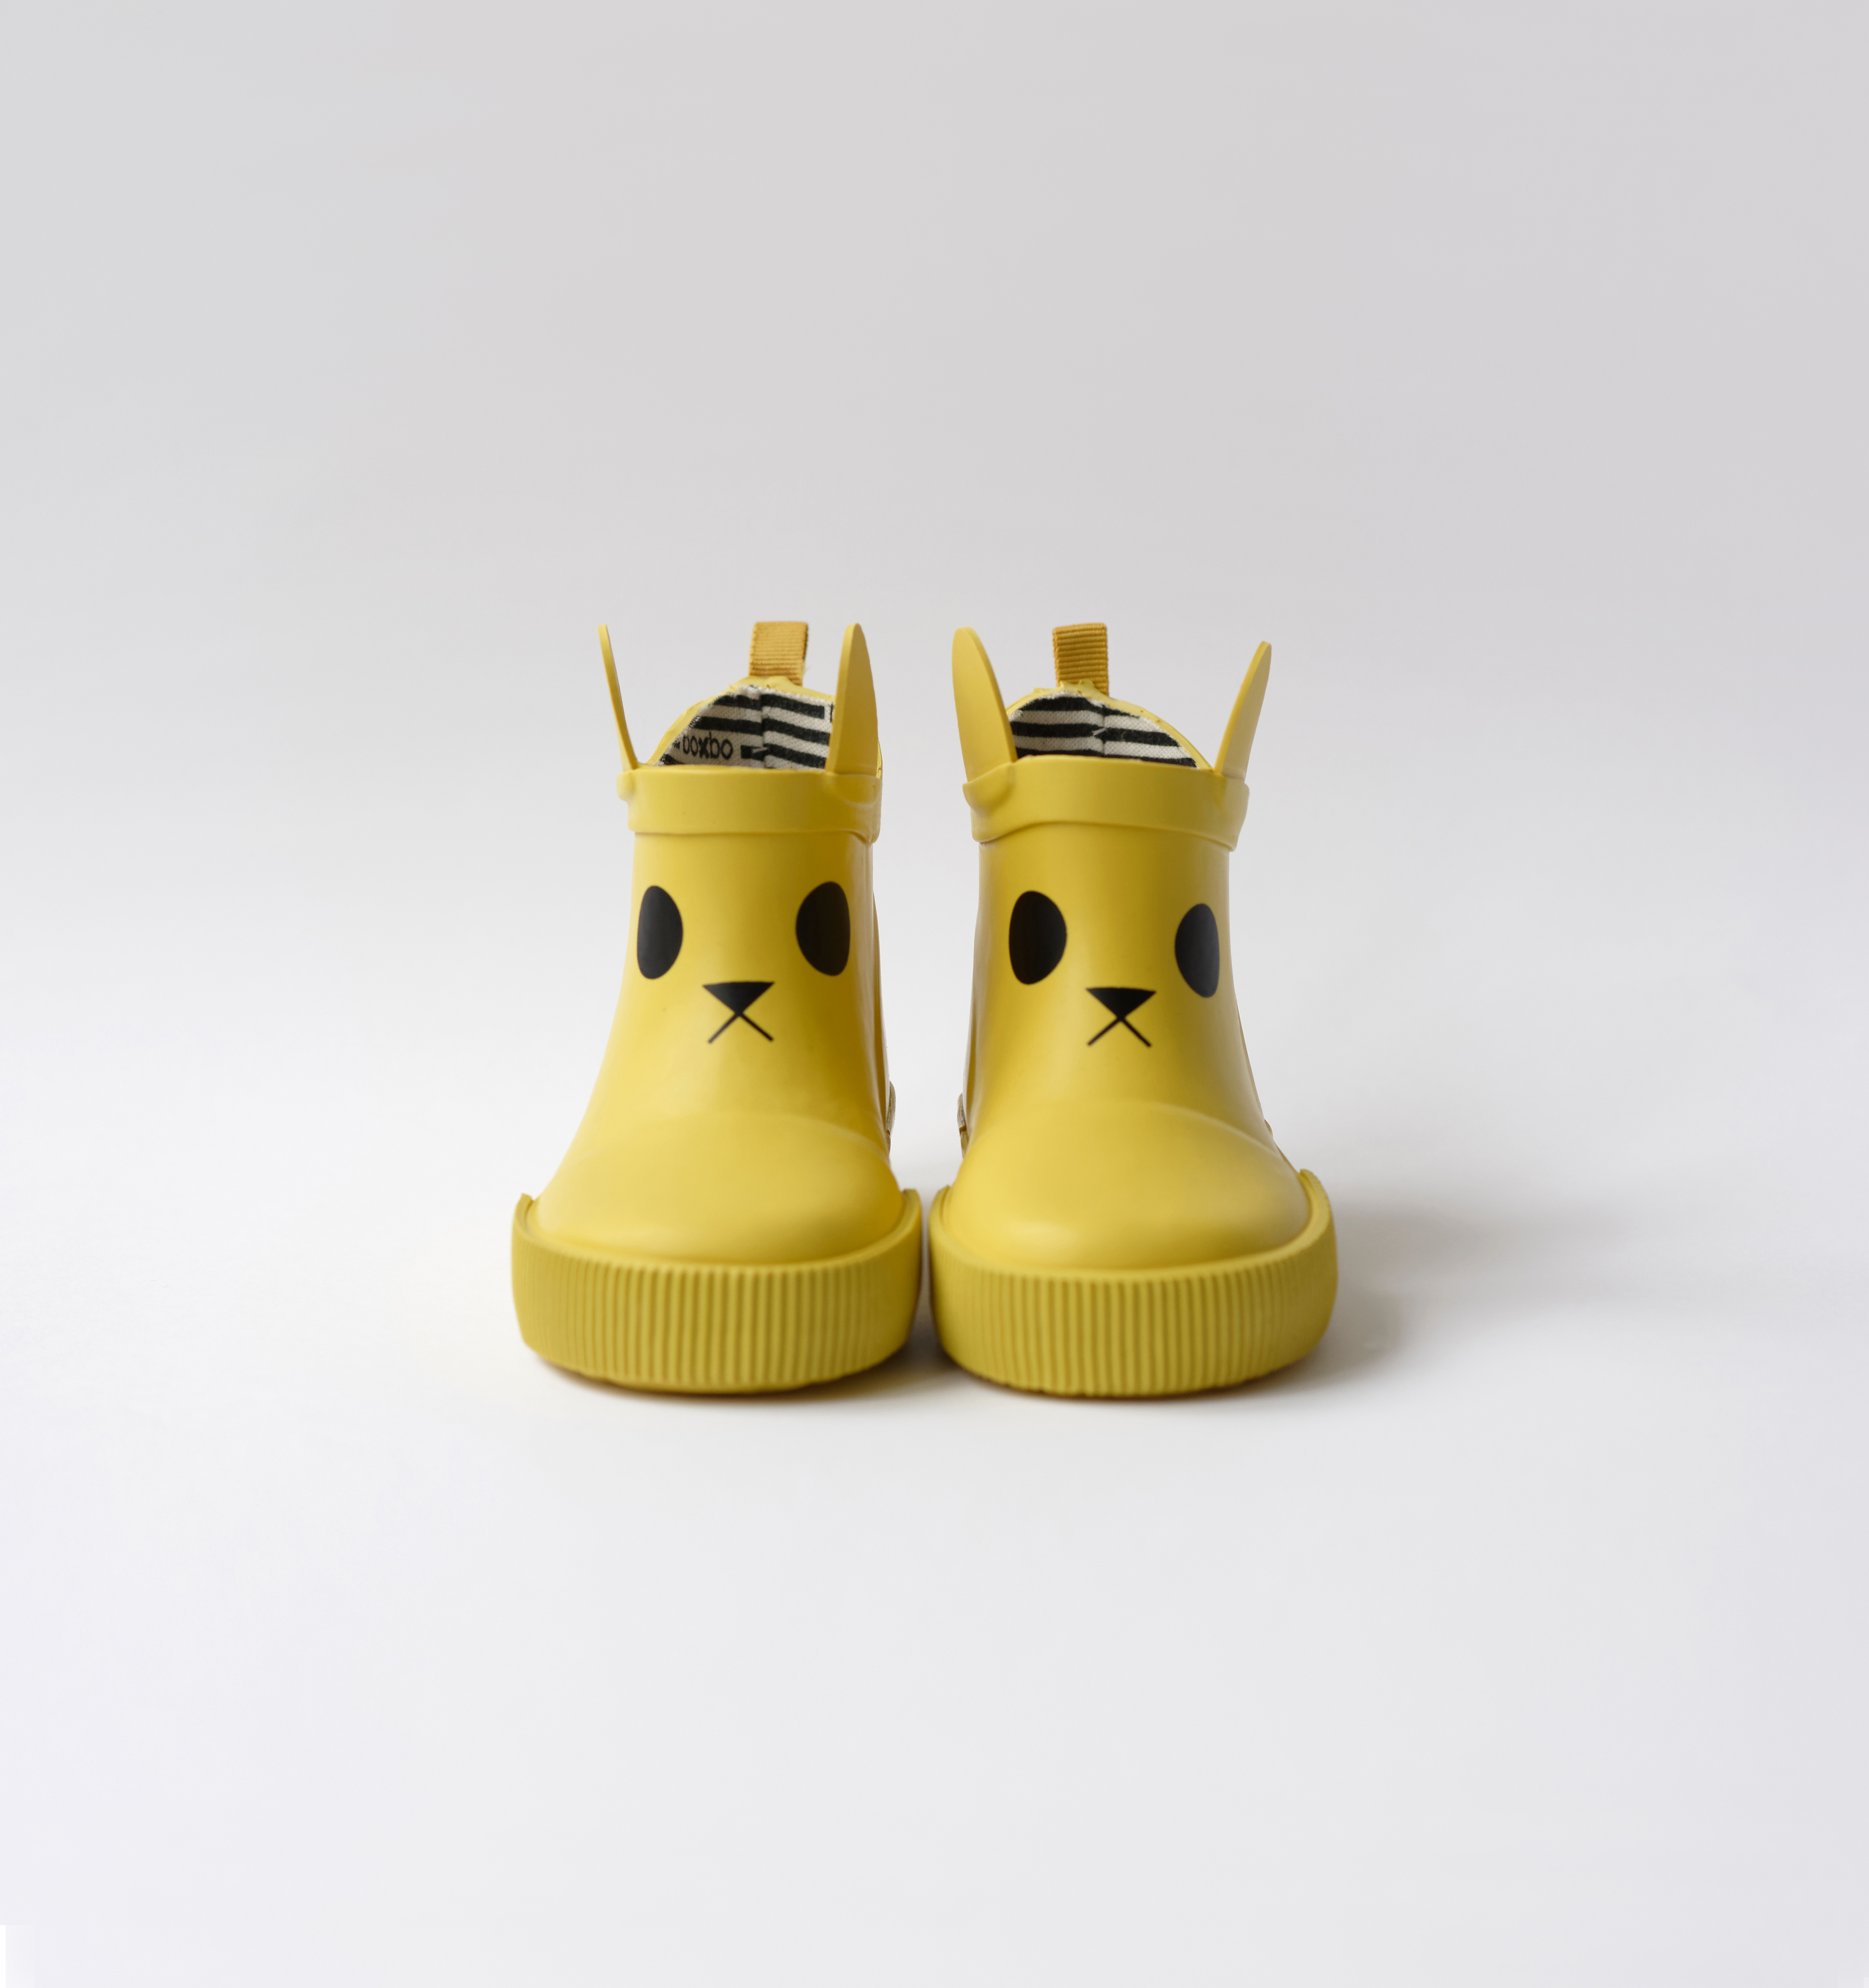 BOXBO 法國時尚雨靴 / 經典時尚雨靴-貓咪黃